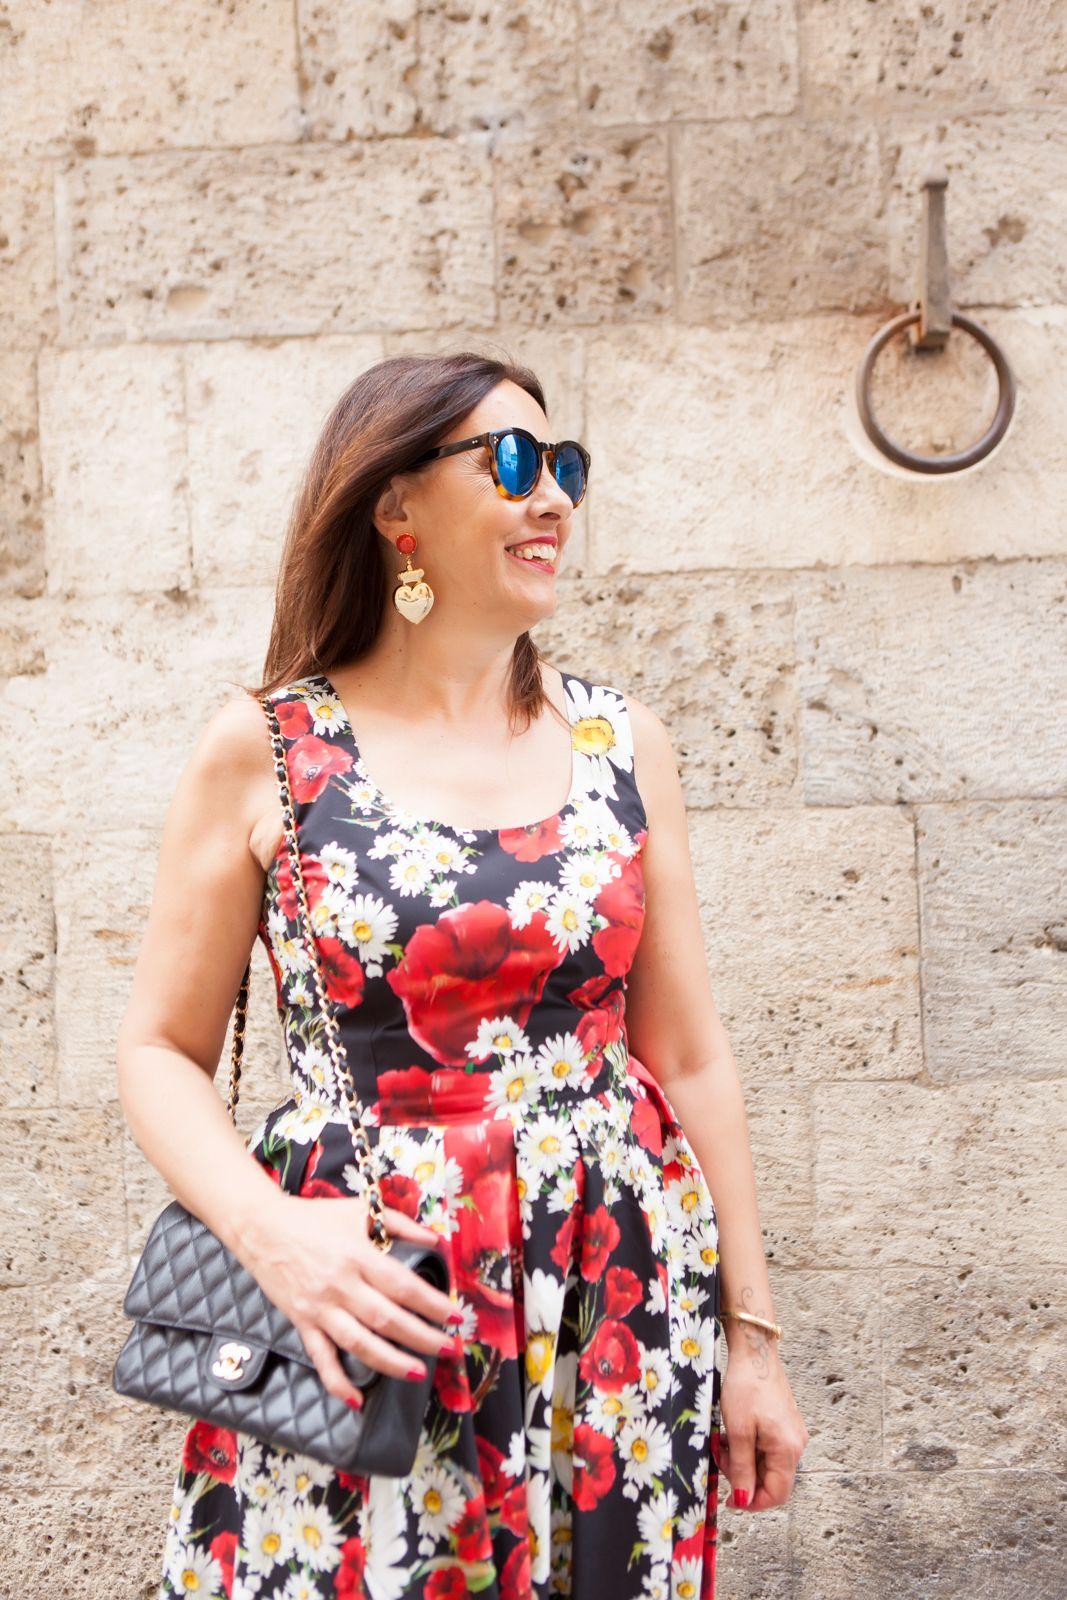 My dress is a flower garden - illesteva sunglasses, dolce gabbana flower dress, amle earrings, marni sandals. photo shooting in Siena - Not Only Twenty Fashion blog